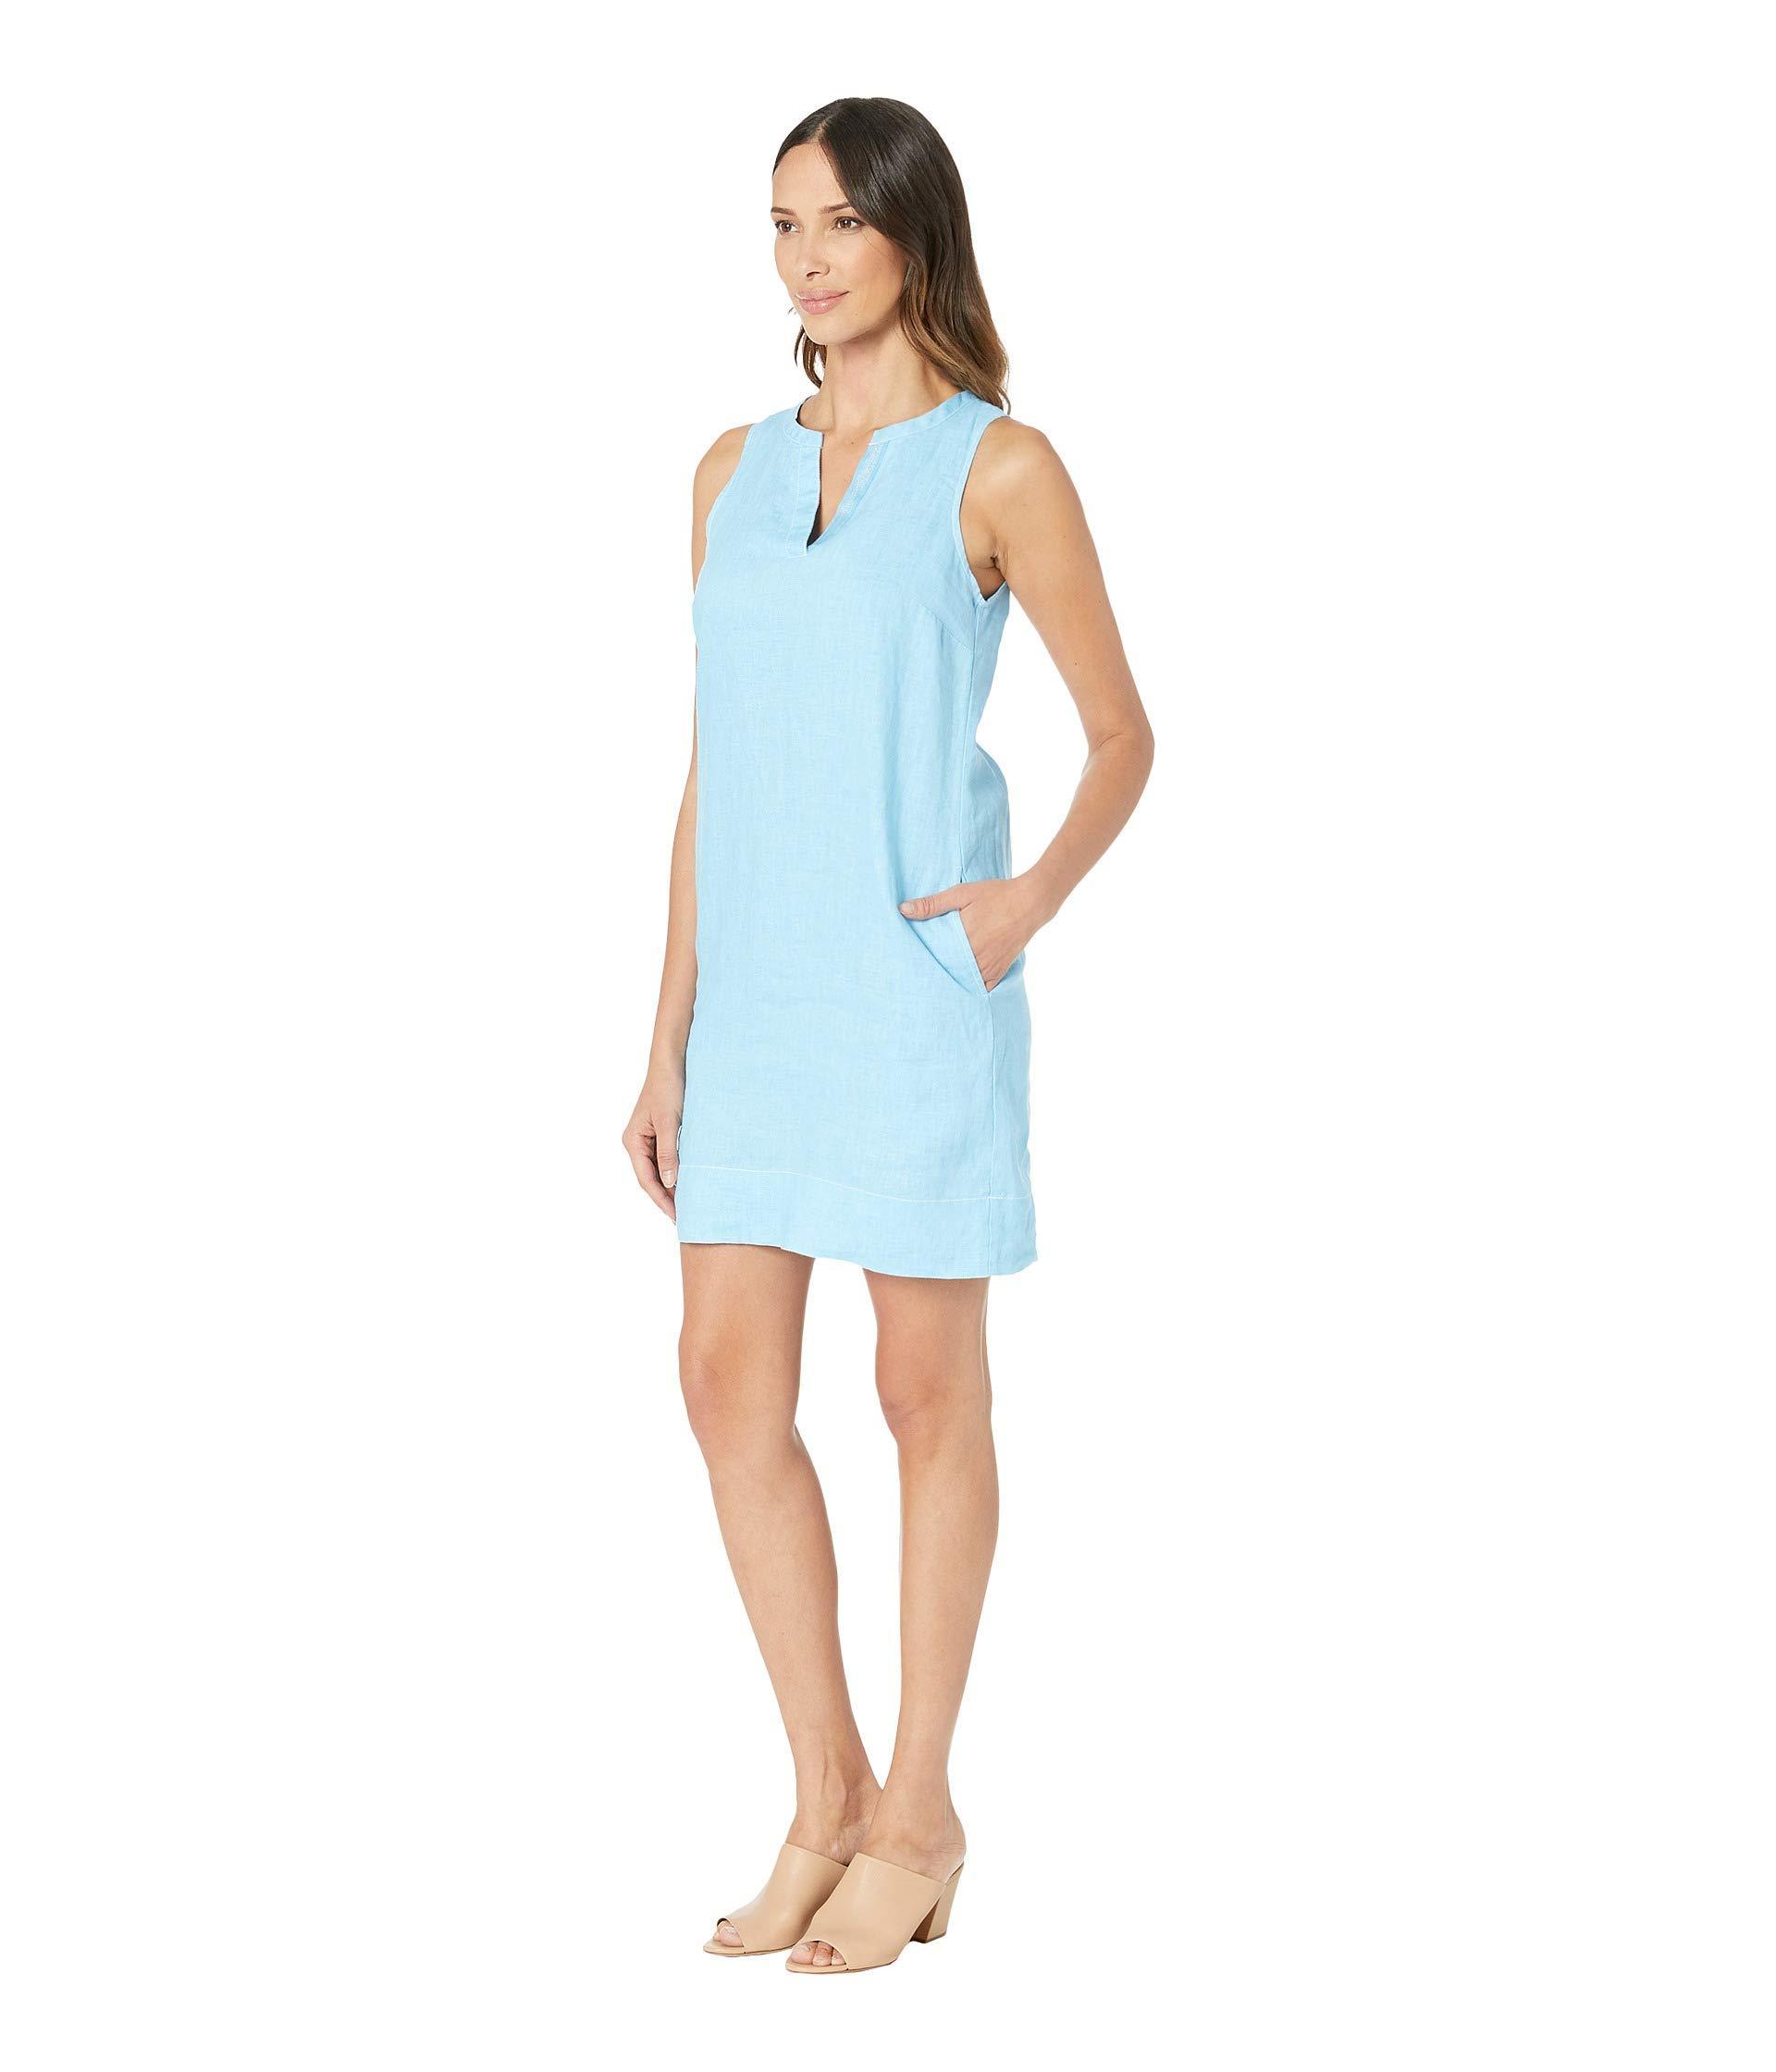 f41511bf722 Lyst - Tommy Bahama Seaglass Linen Shift Dress (scandia Blue) Women s Dress  in Blue